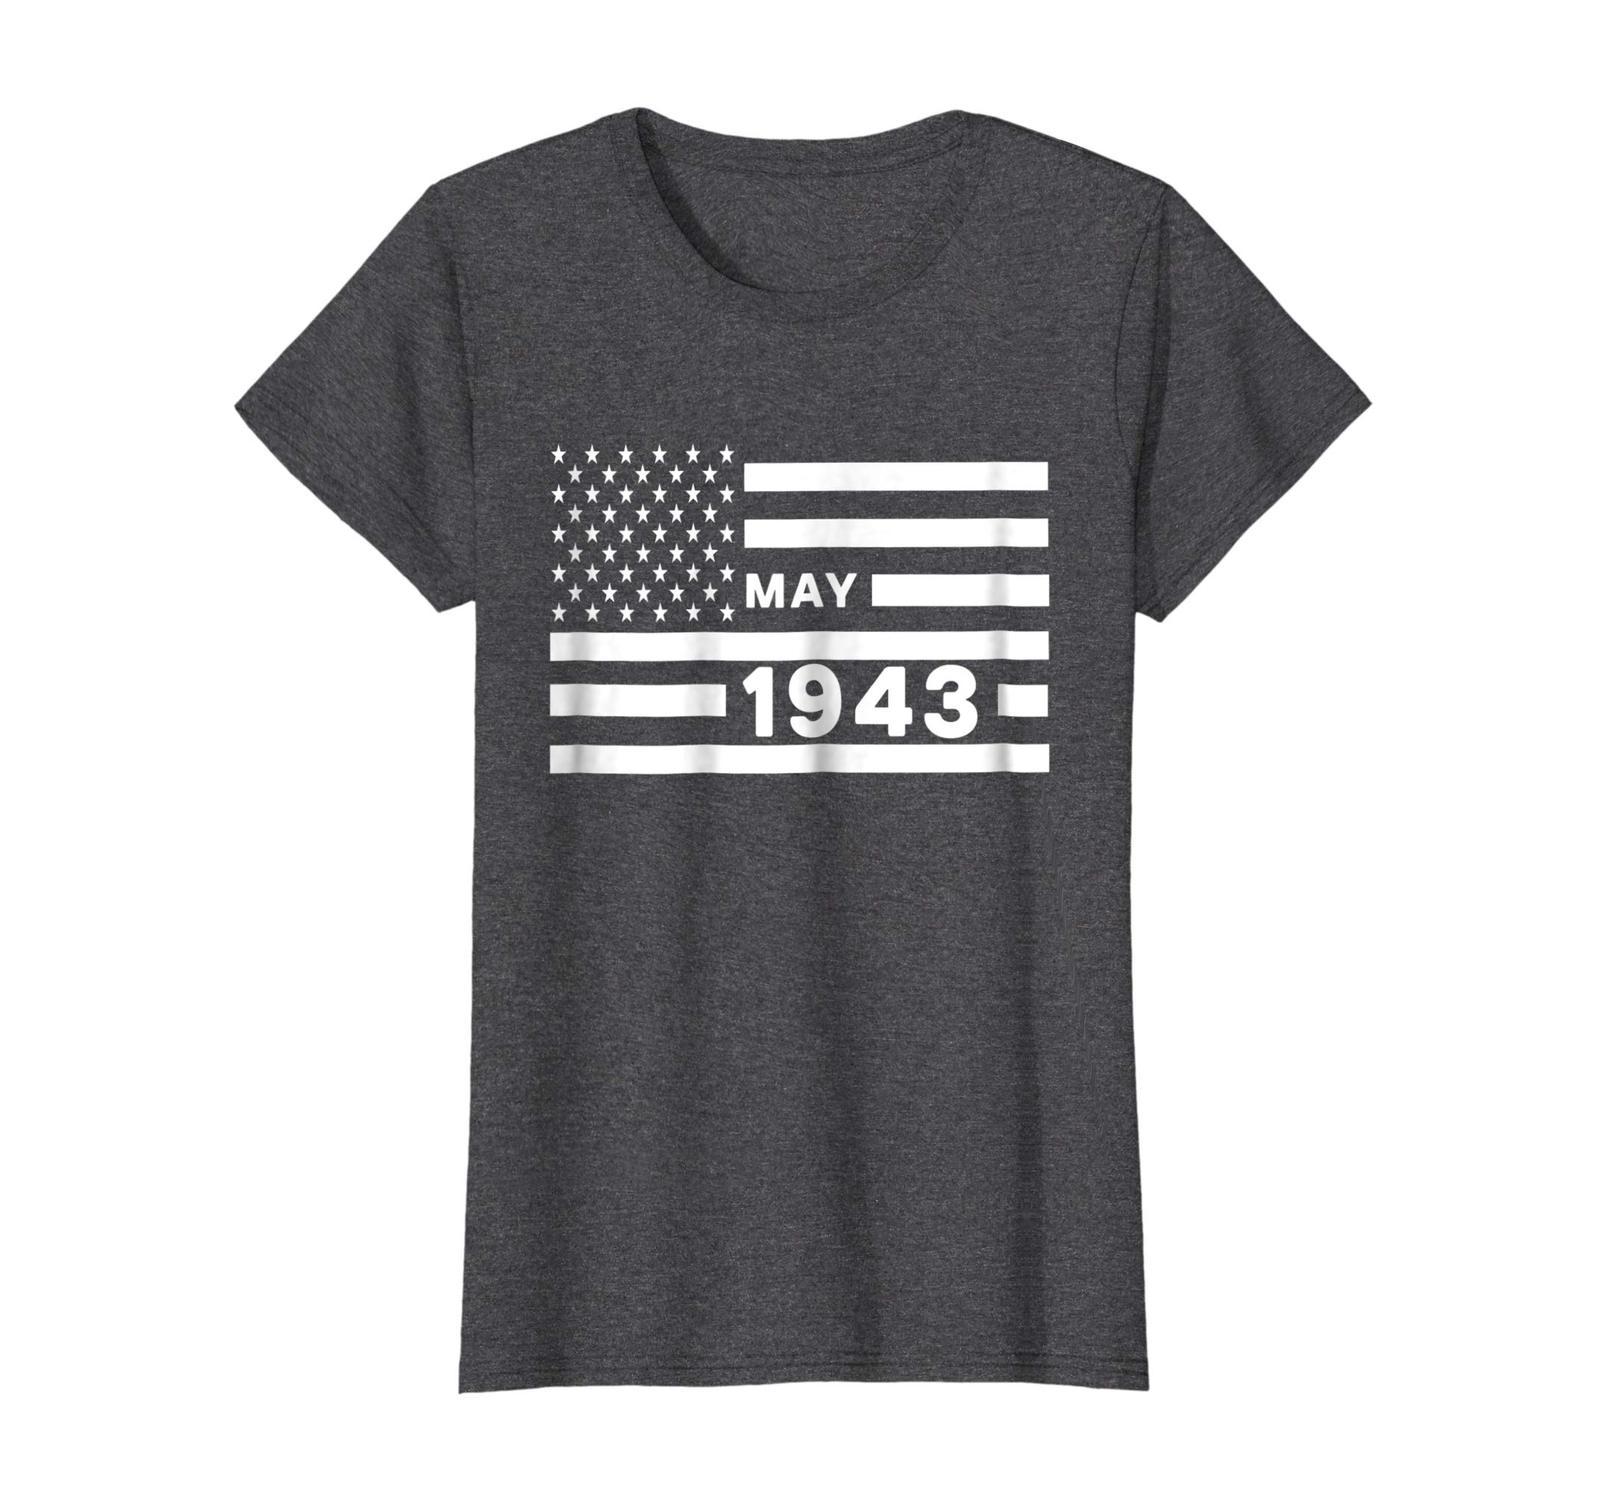 Dad Shirts -  America Flag May 1943 75th Year Old Birthday Shirt Gift Wowen